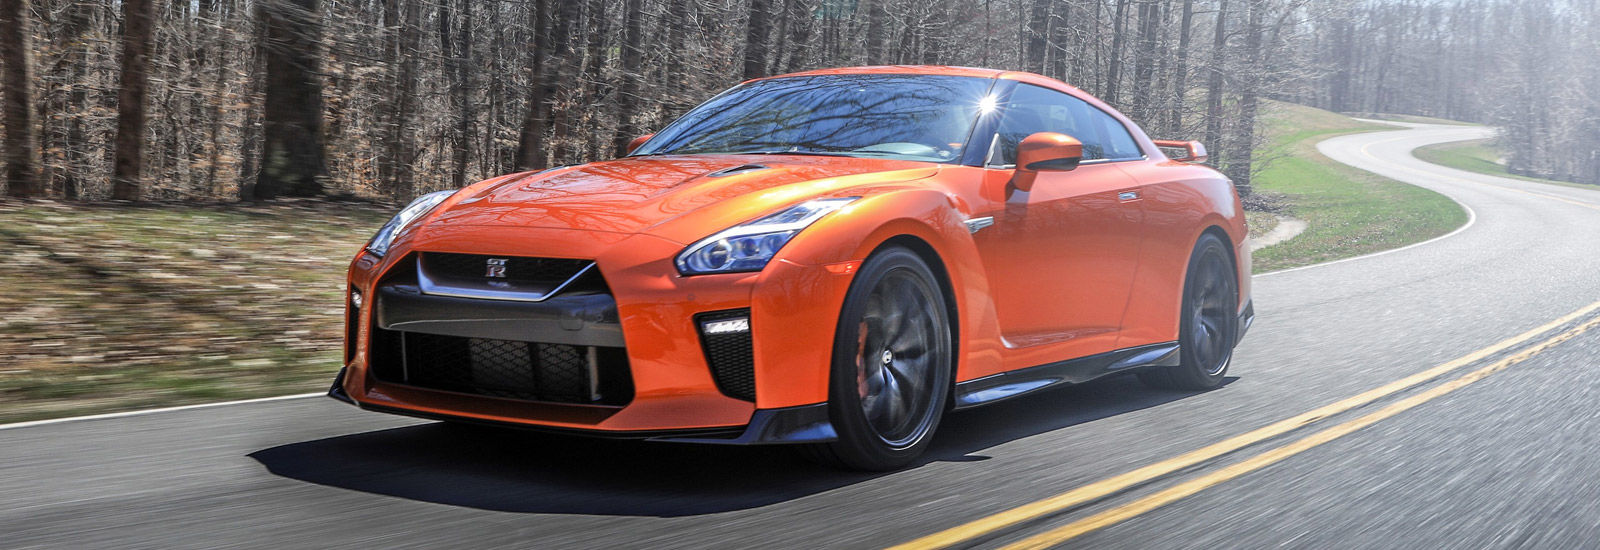 r36 Looks pretty good. - R35 GT-R - Nissan GT-R Heritage